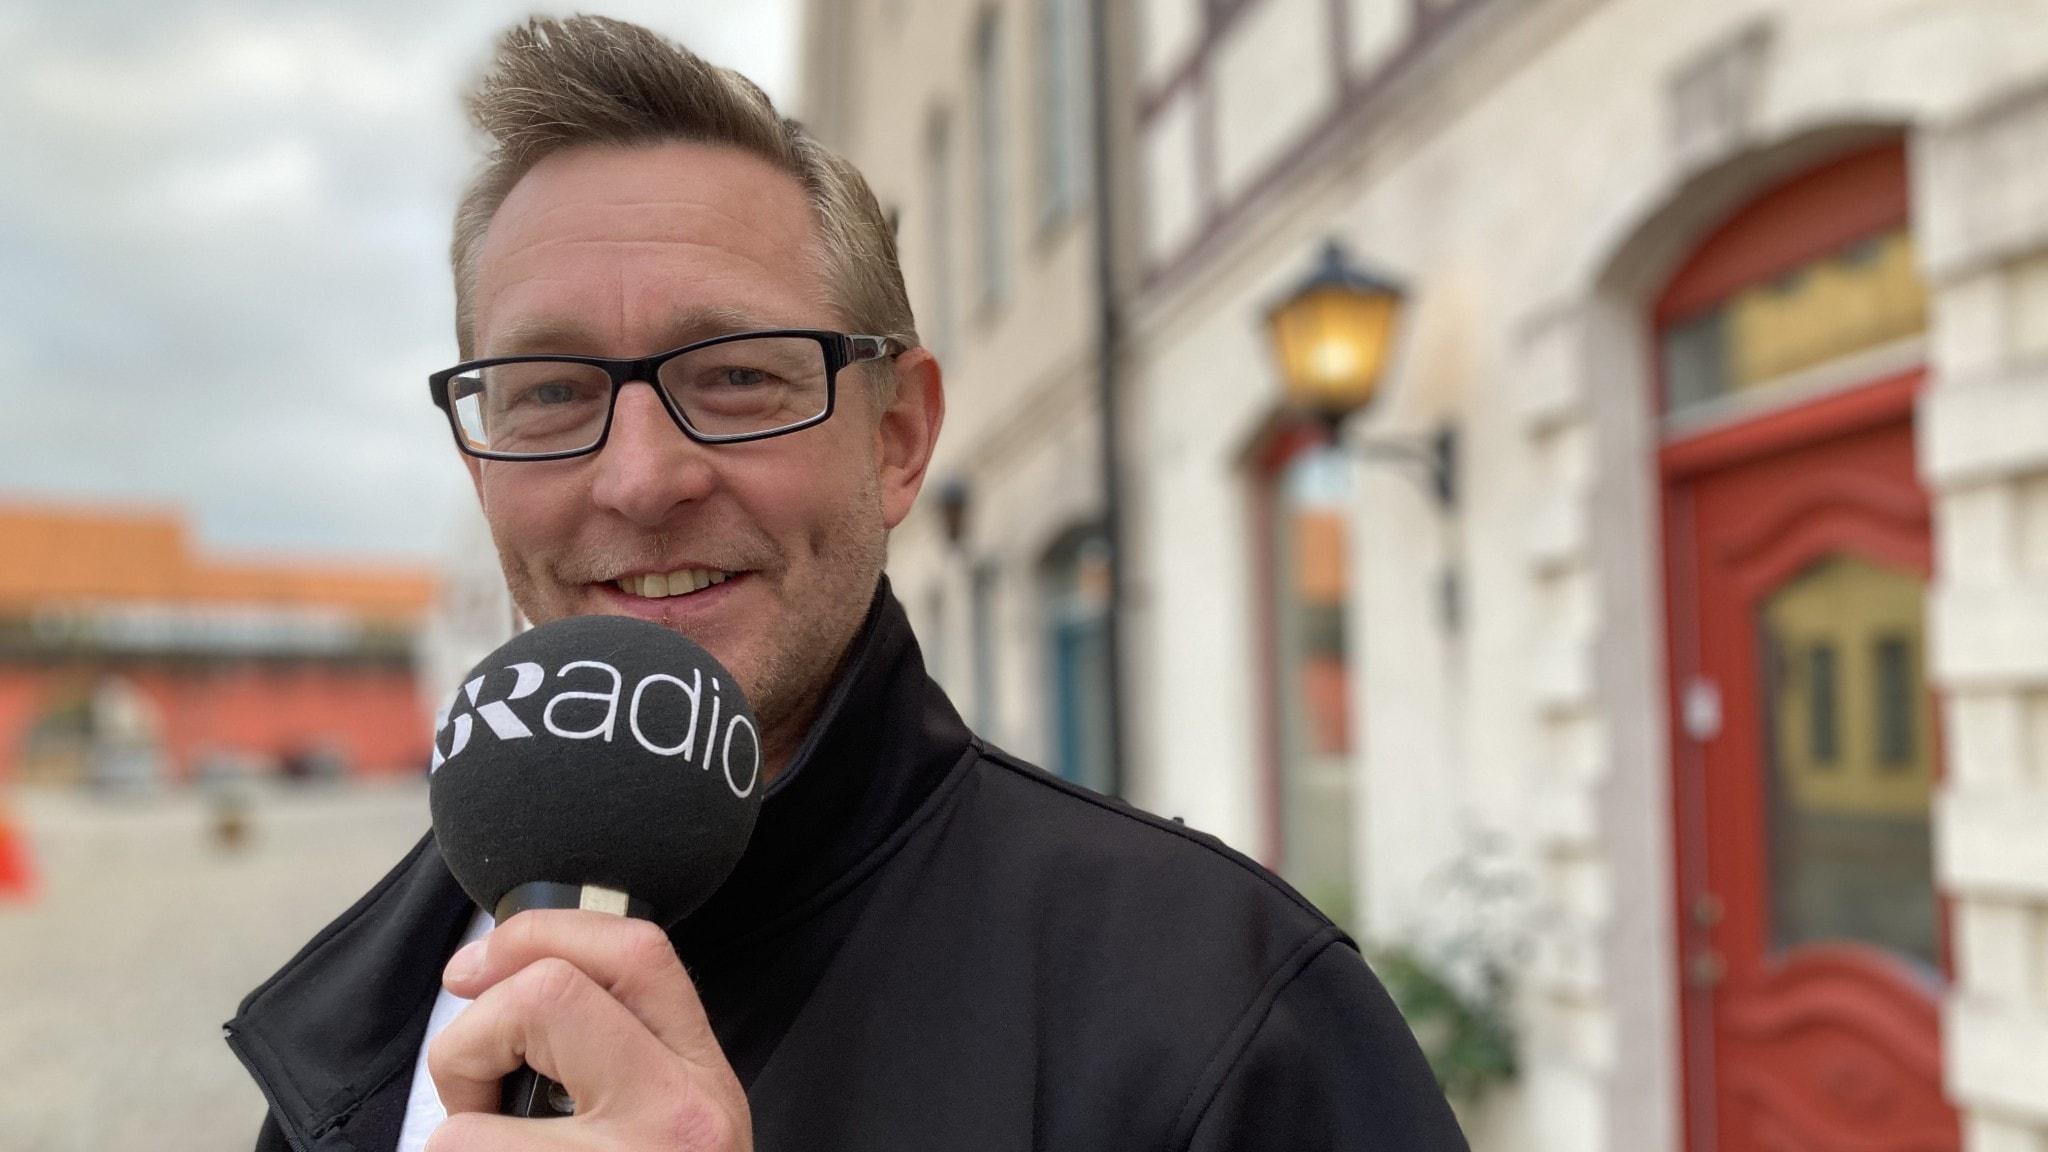 Fredrik Grönvall, Voize hemma på en kullerstensgata i Jakriborg, Hjärup.